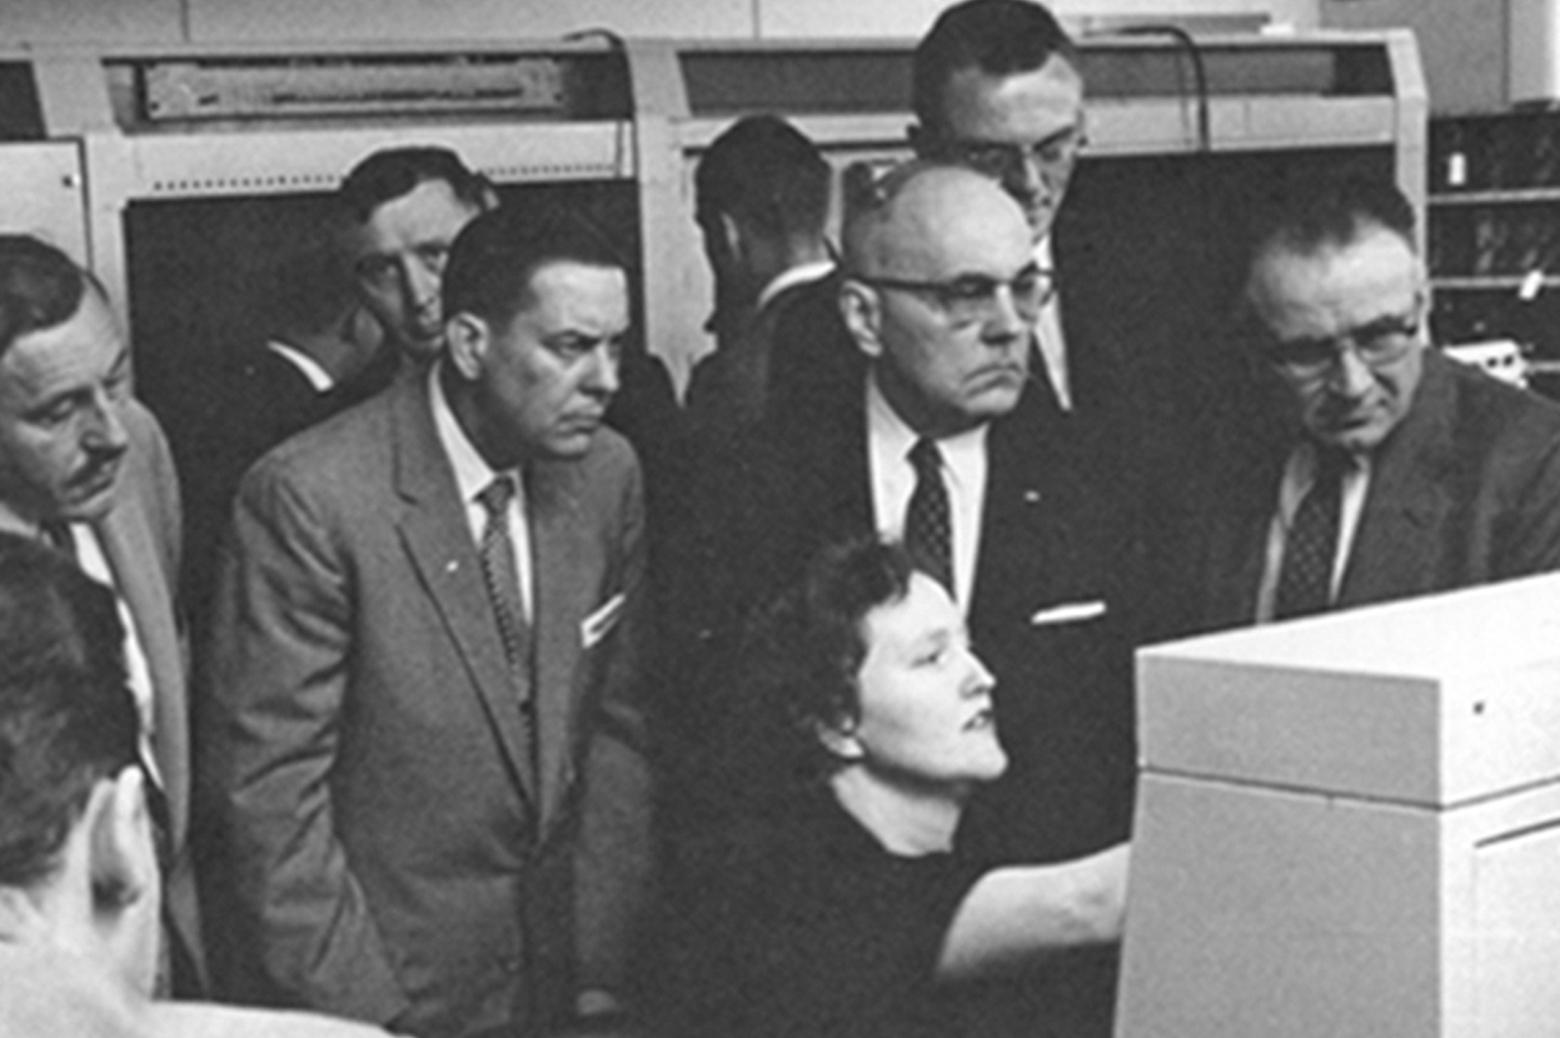 Irma Wyman at a computer